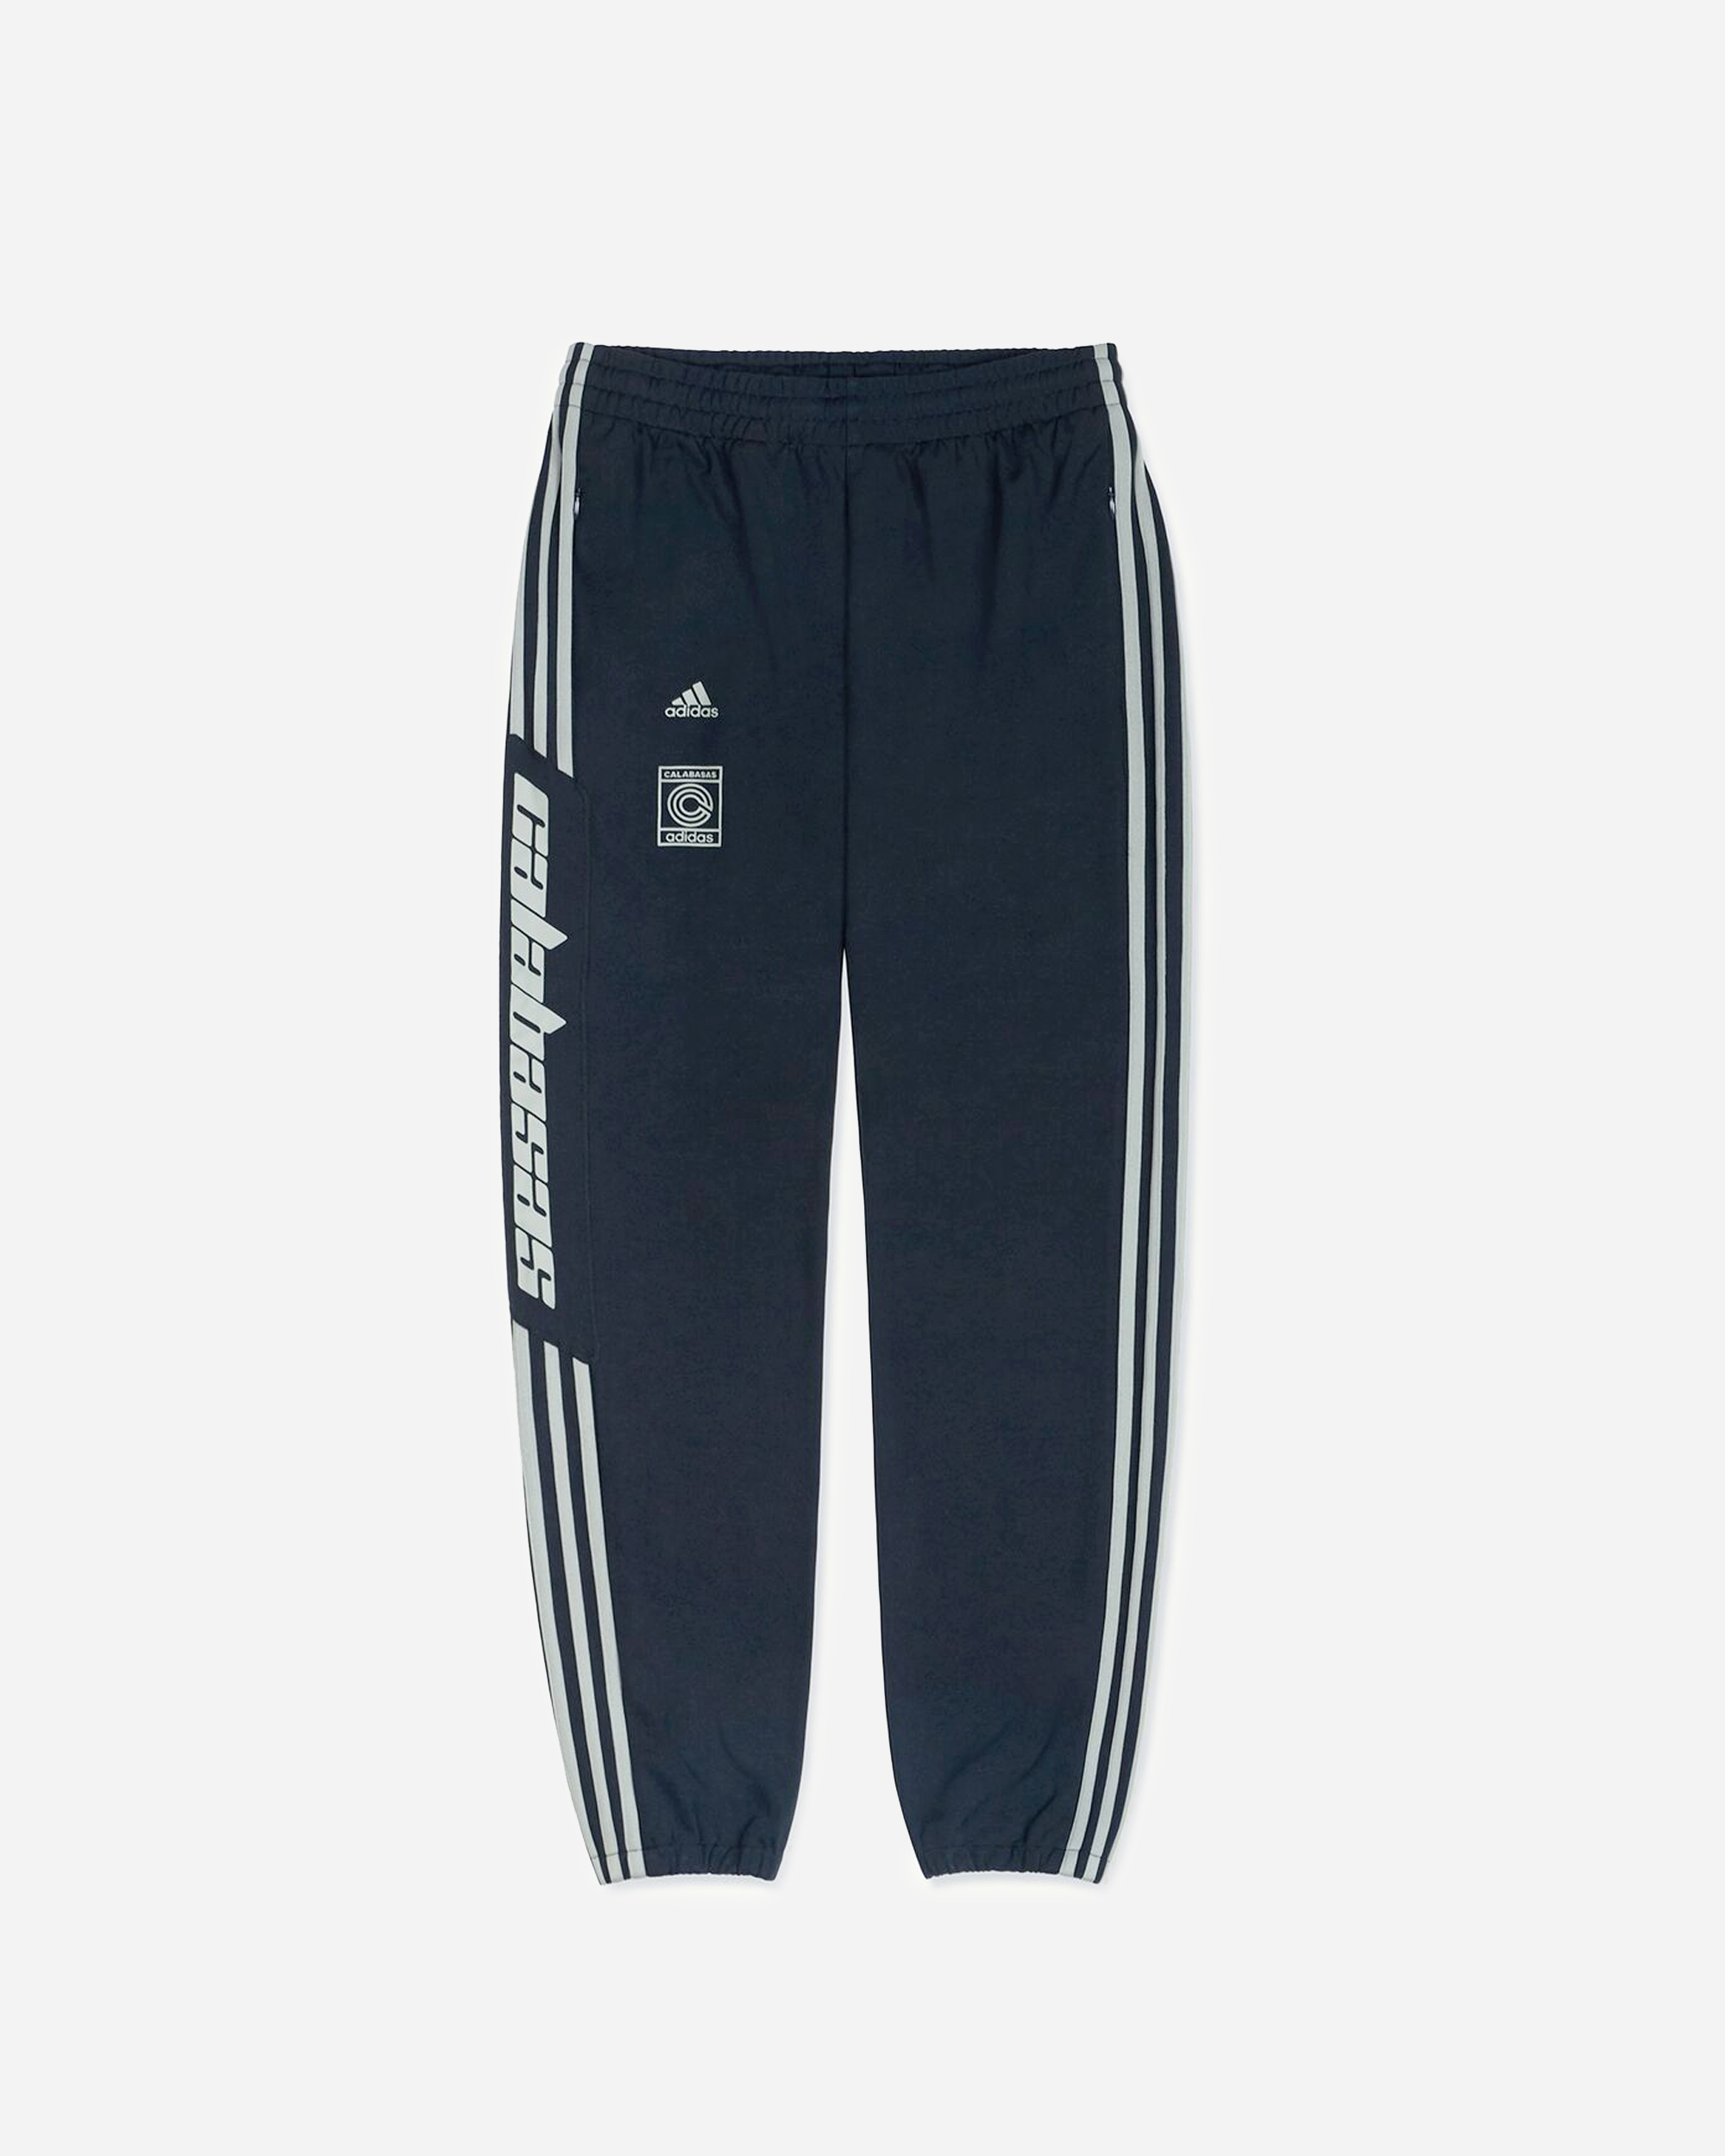 Adidas Originals Yeezy Calabasas Track